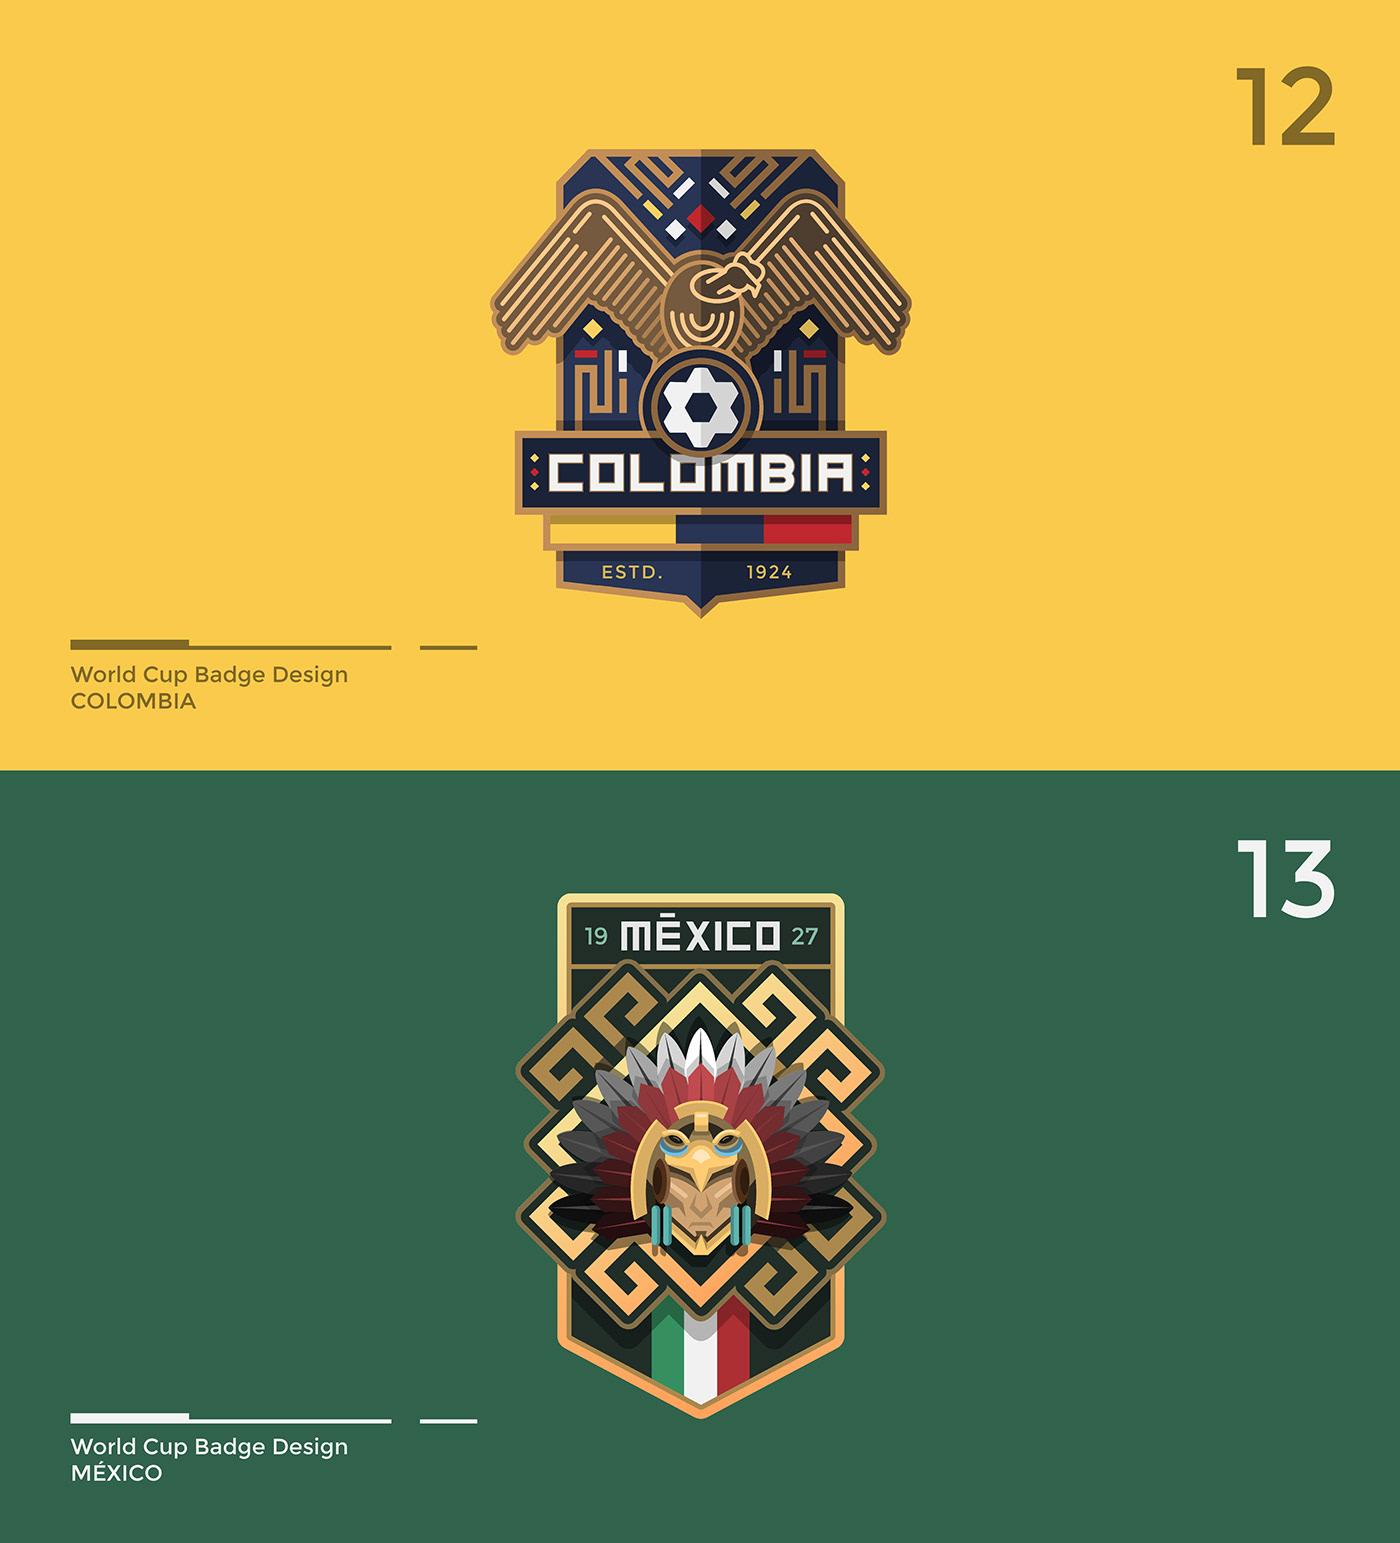 escudos-equipos-copa-mundo-2018-rediseñados-moises-fernandez